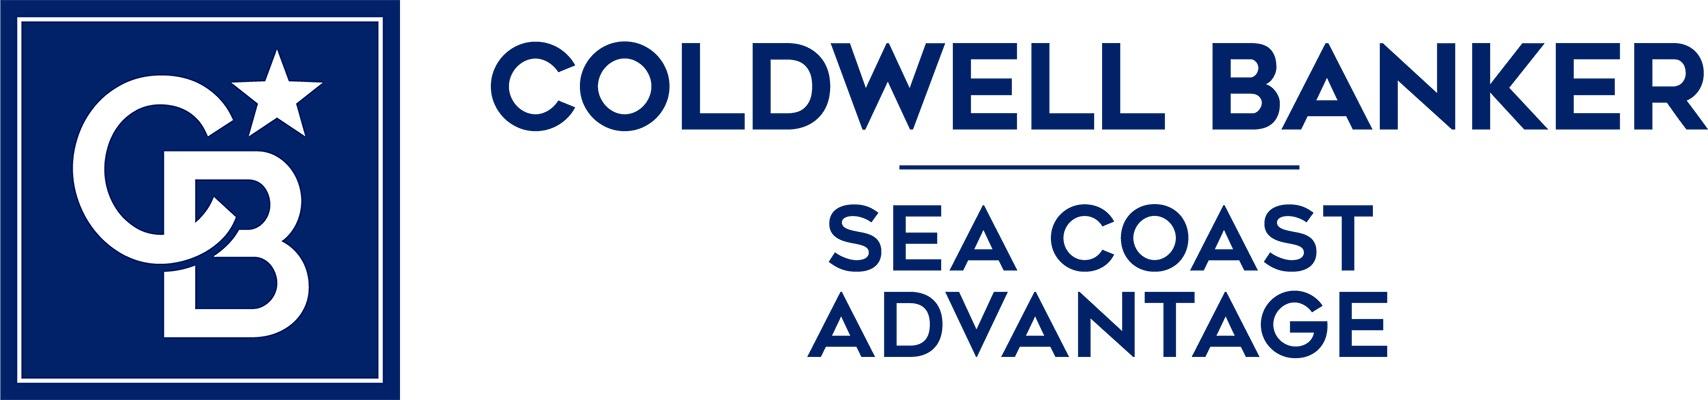 Vincent Espinoso - Coldwell Banker Sea Coast Advantage Realty Logo